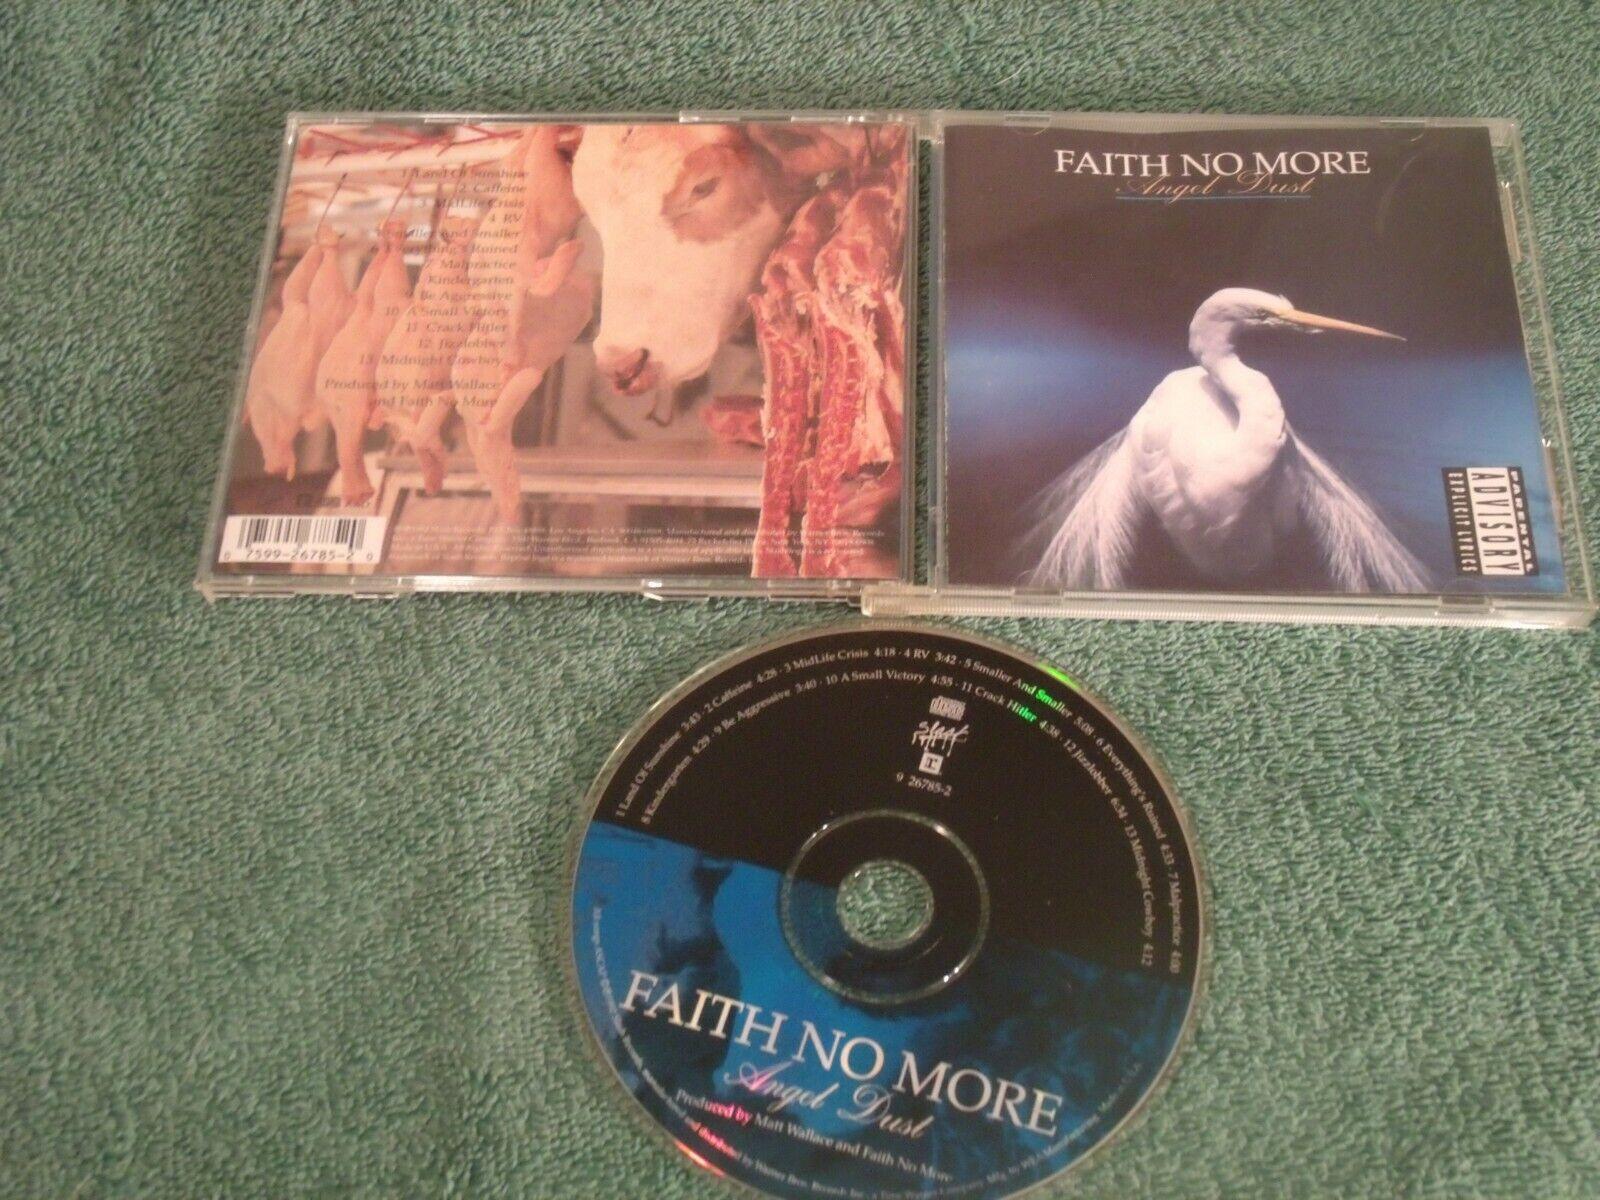 FAITH NO MORE- ANGEL DUST PA  - $2.00